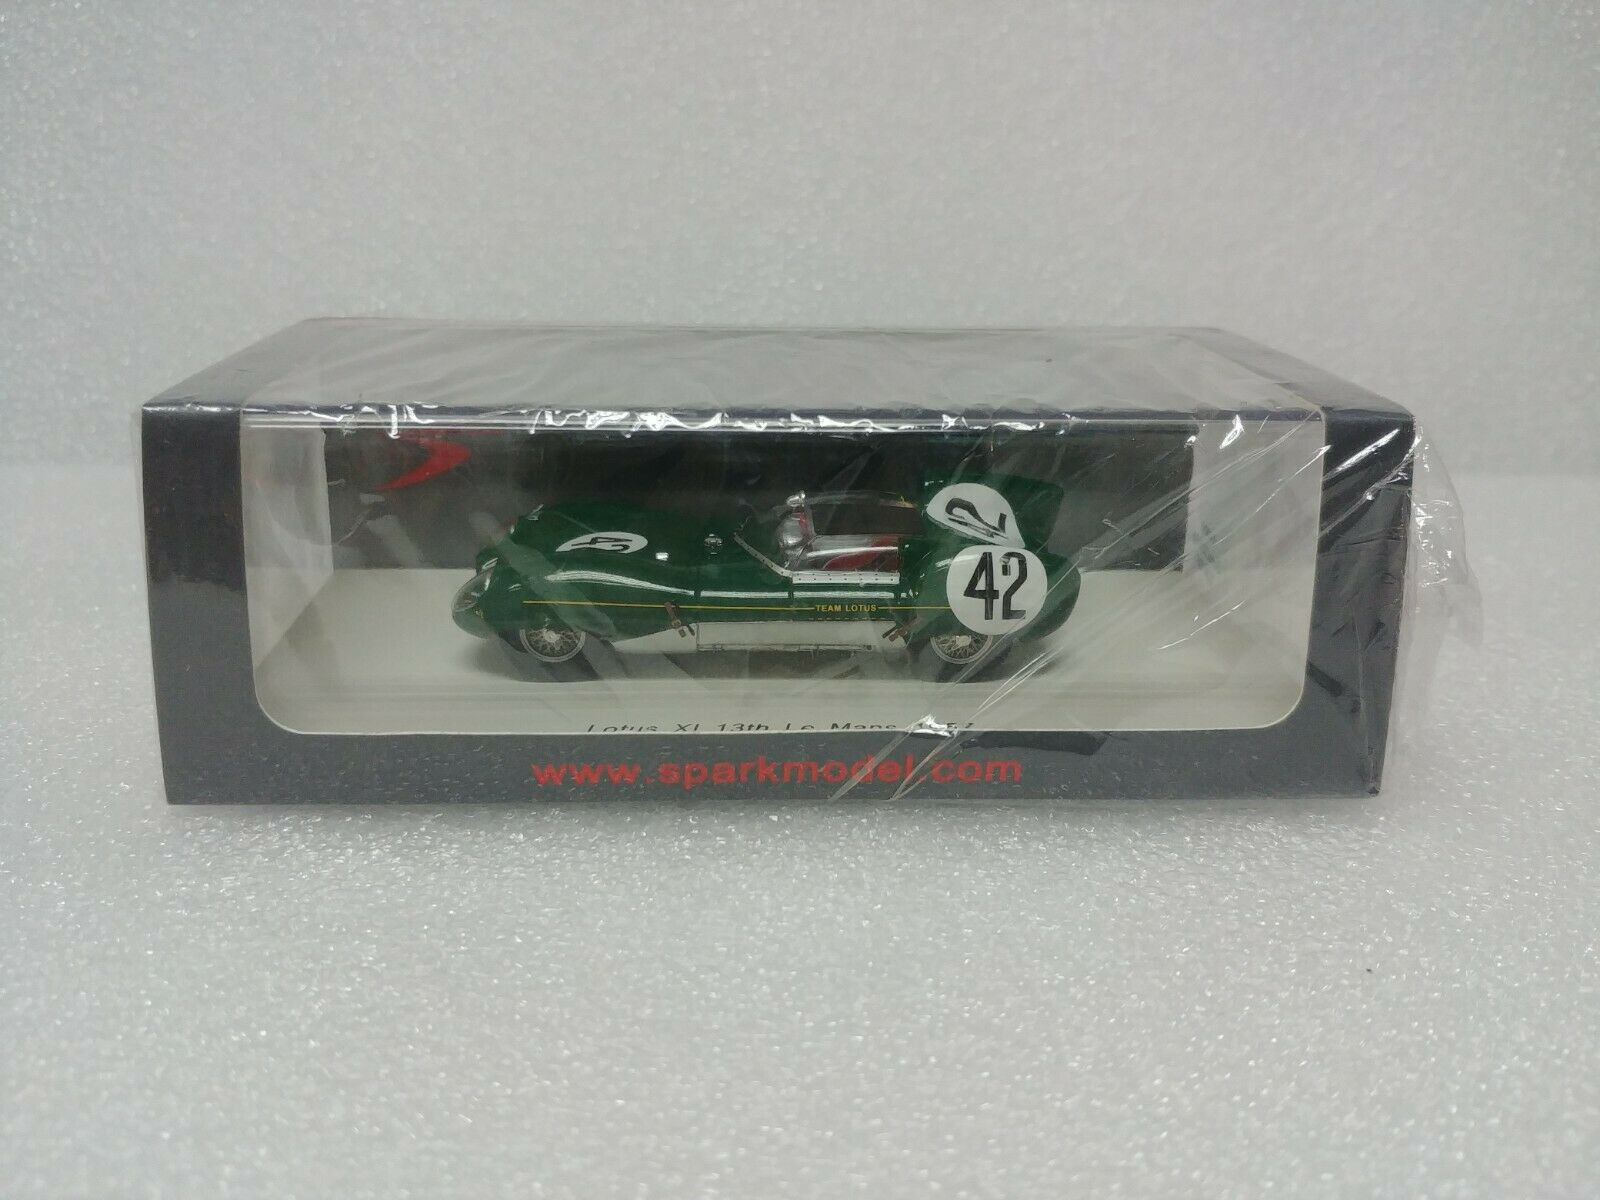 Lotus XI No.42 13th Le Mans 1957 SPARK MODEL 1 43  S4400